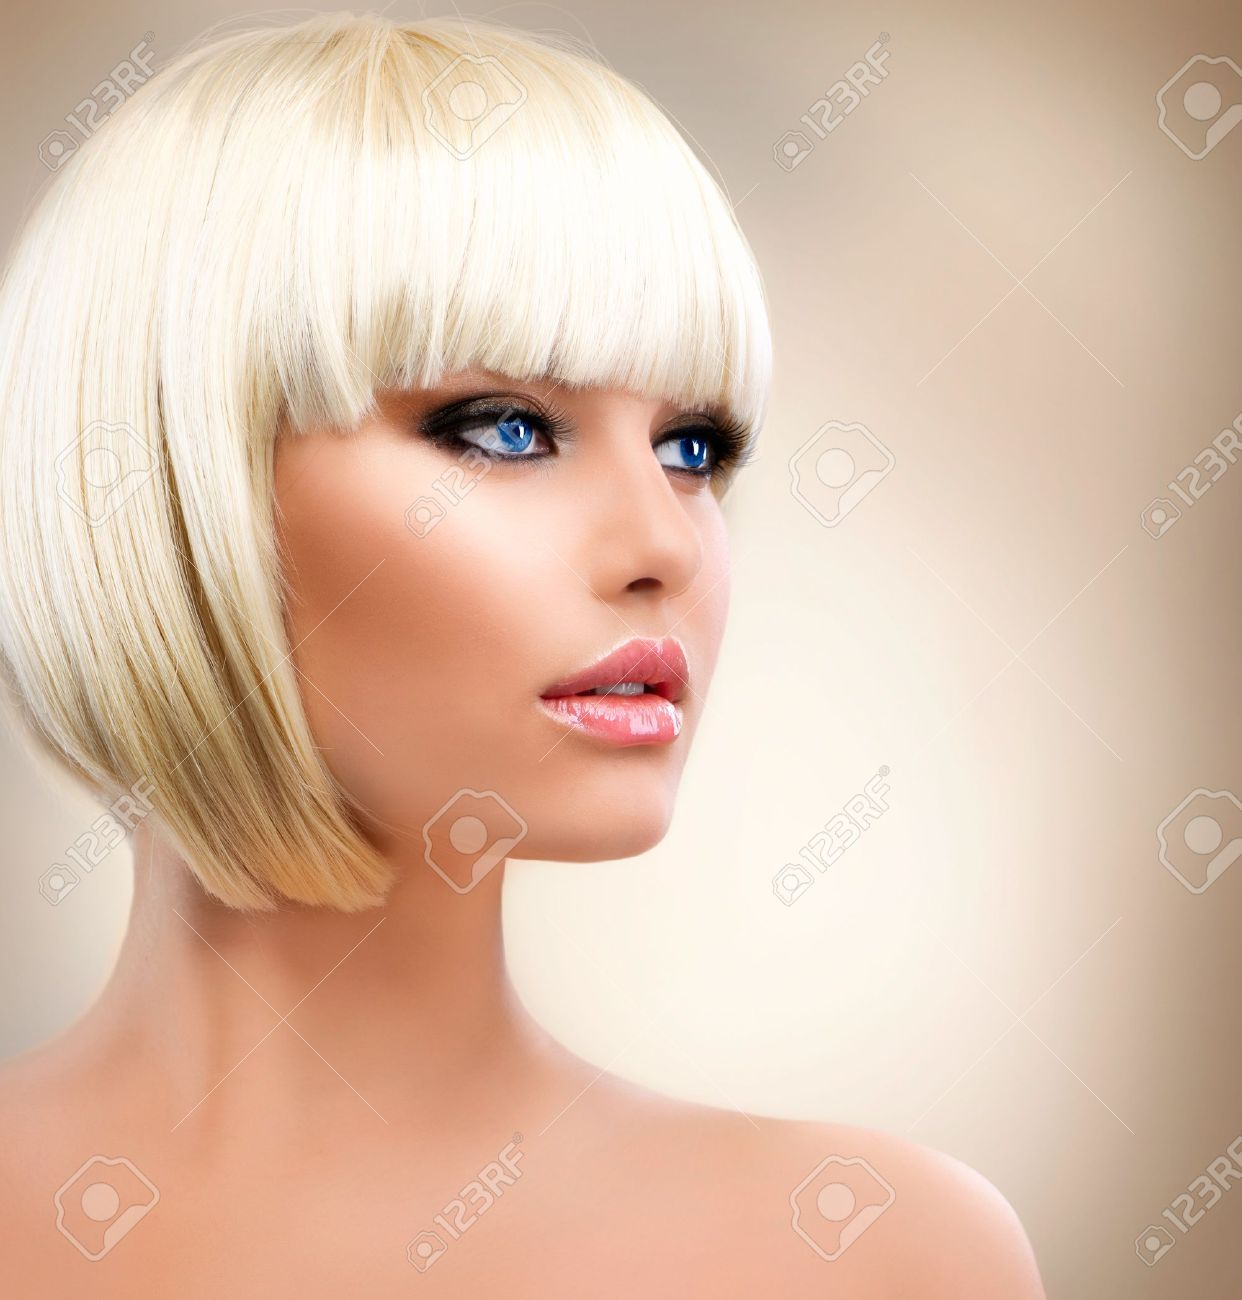 Blonde Girl Portrait  Blond Hair  Hairstyle  Stylish Make-up Stock Photo - 14646695